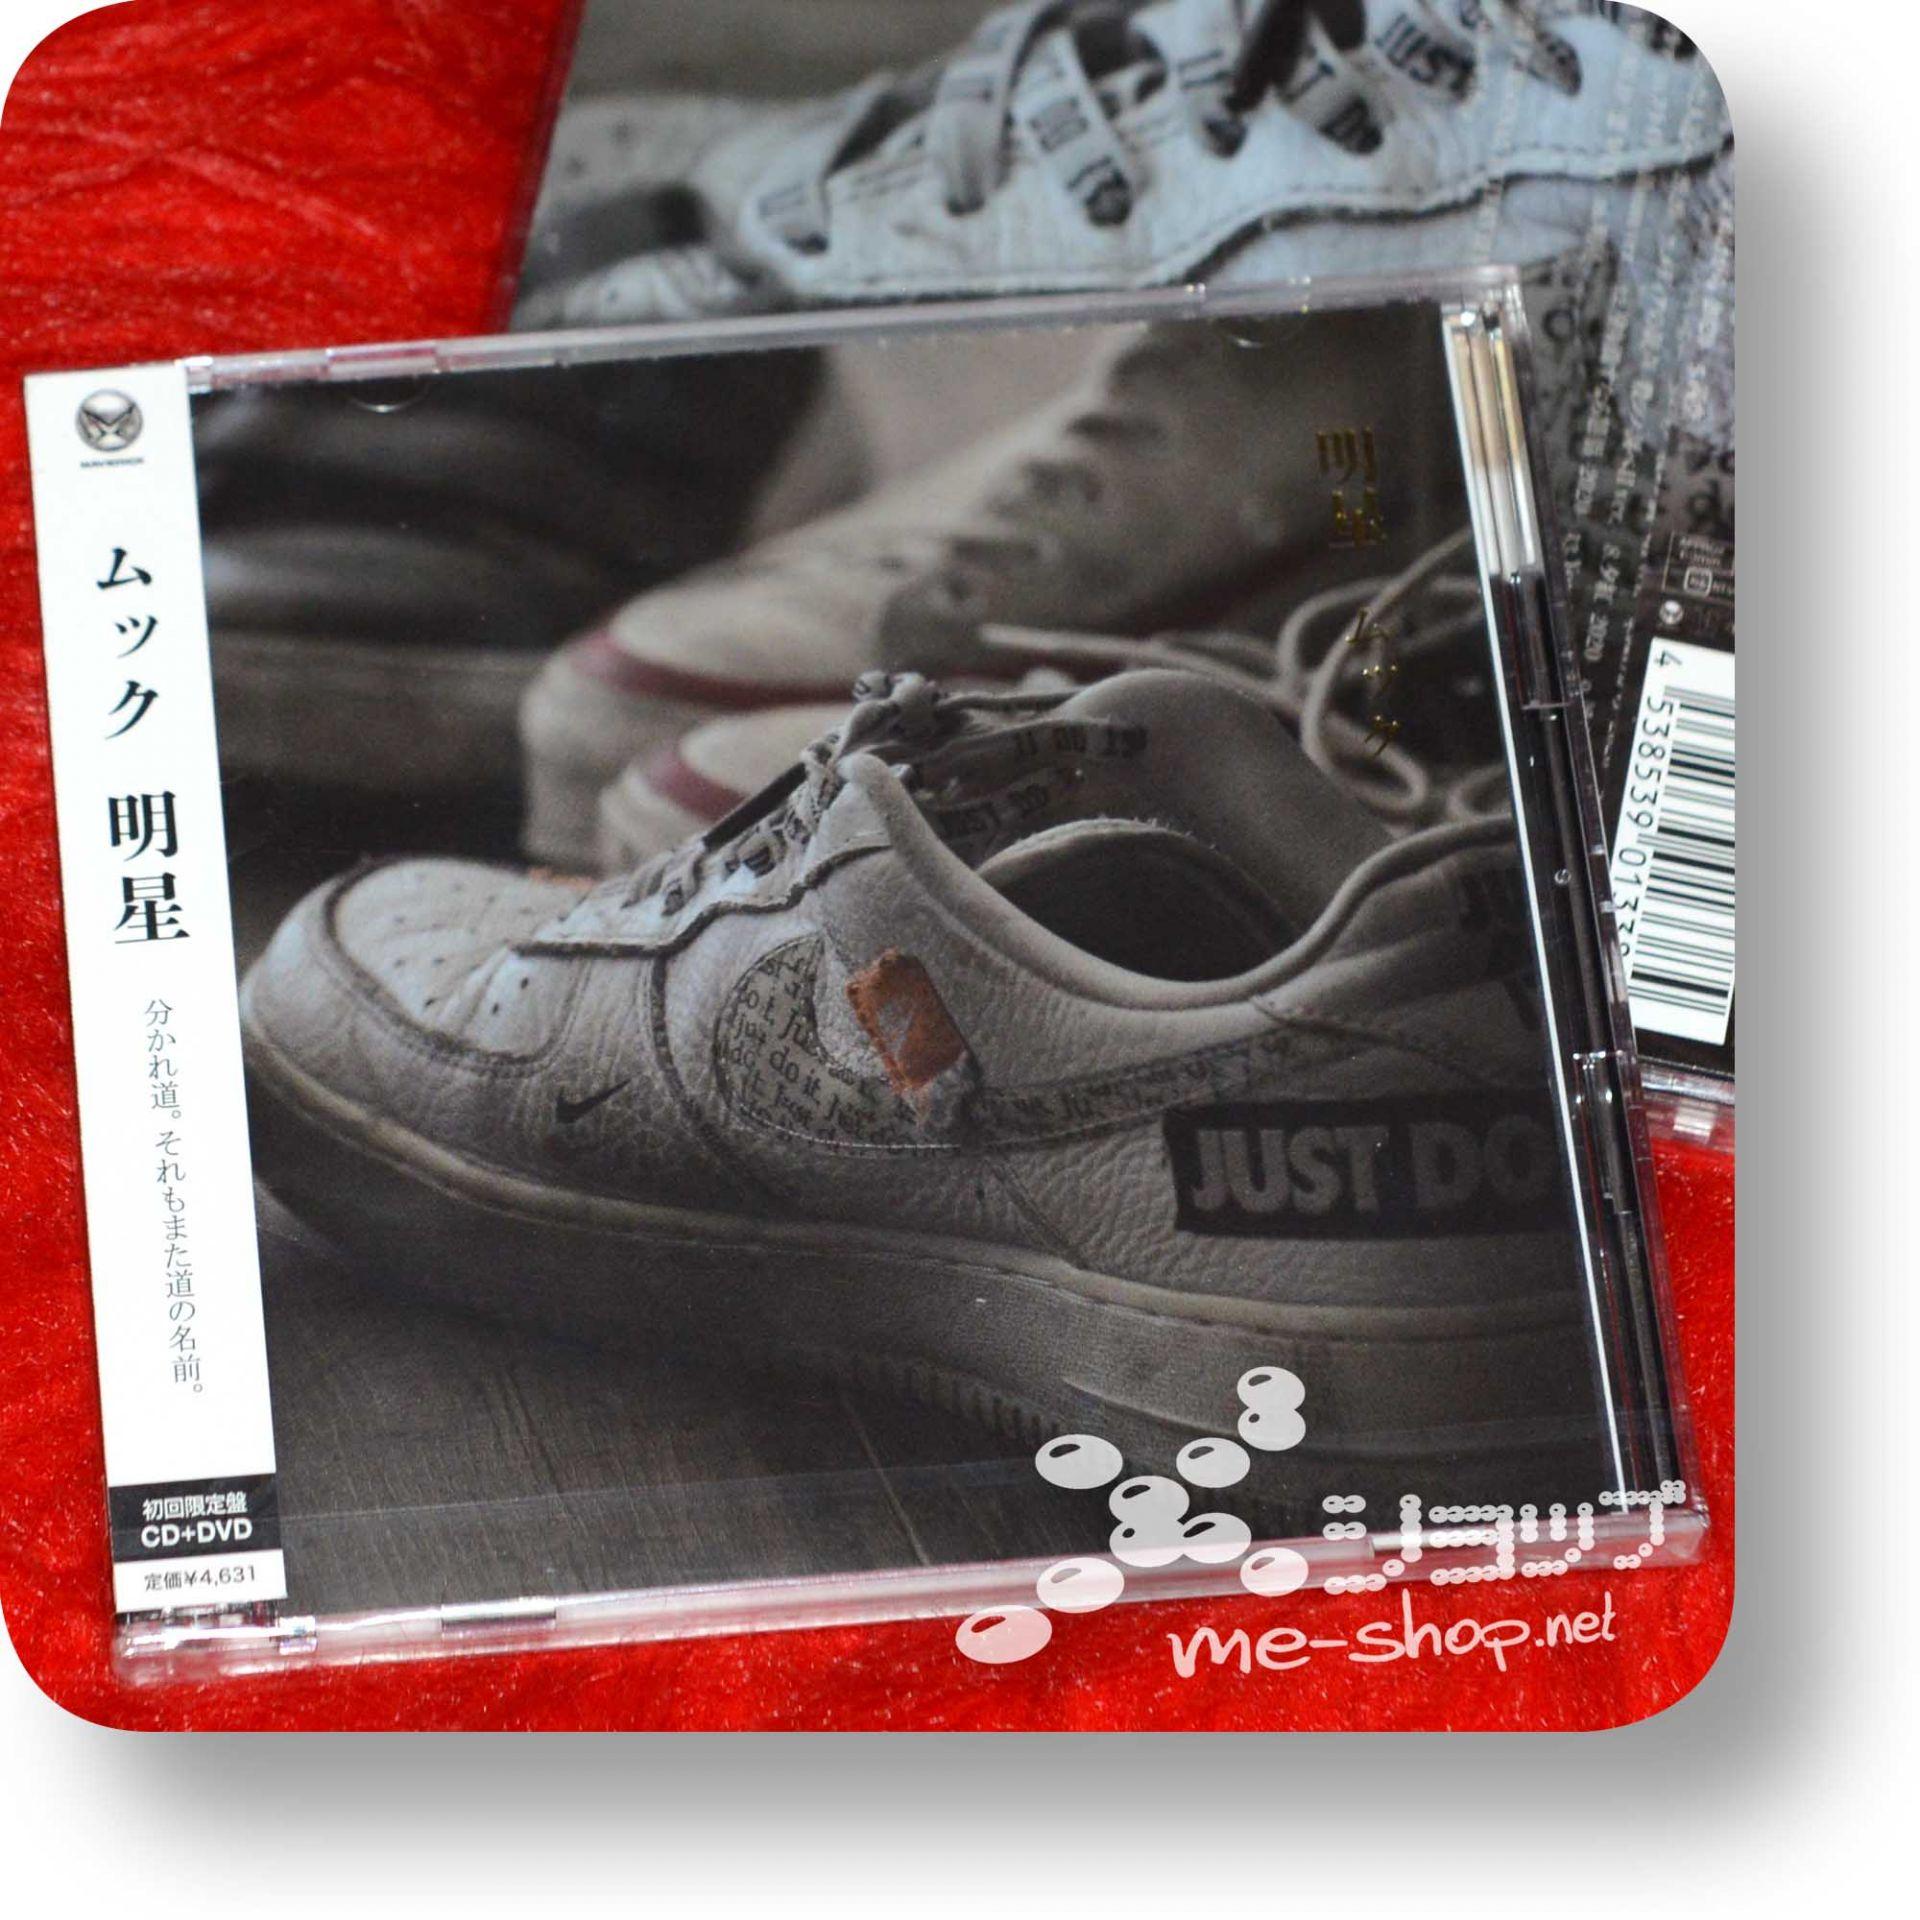 mucc myoujou cd+dvd